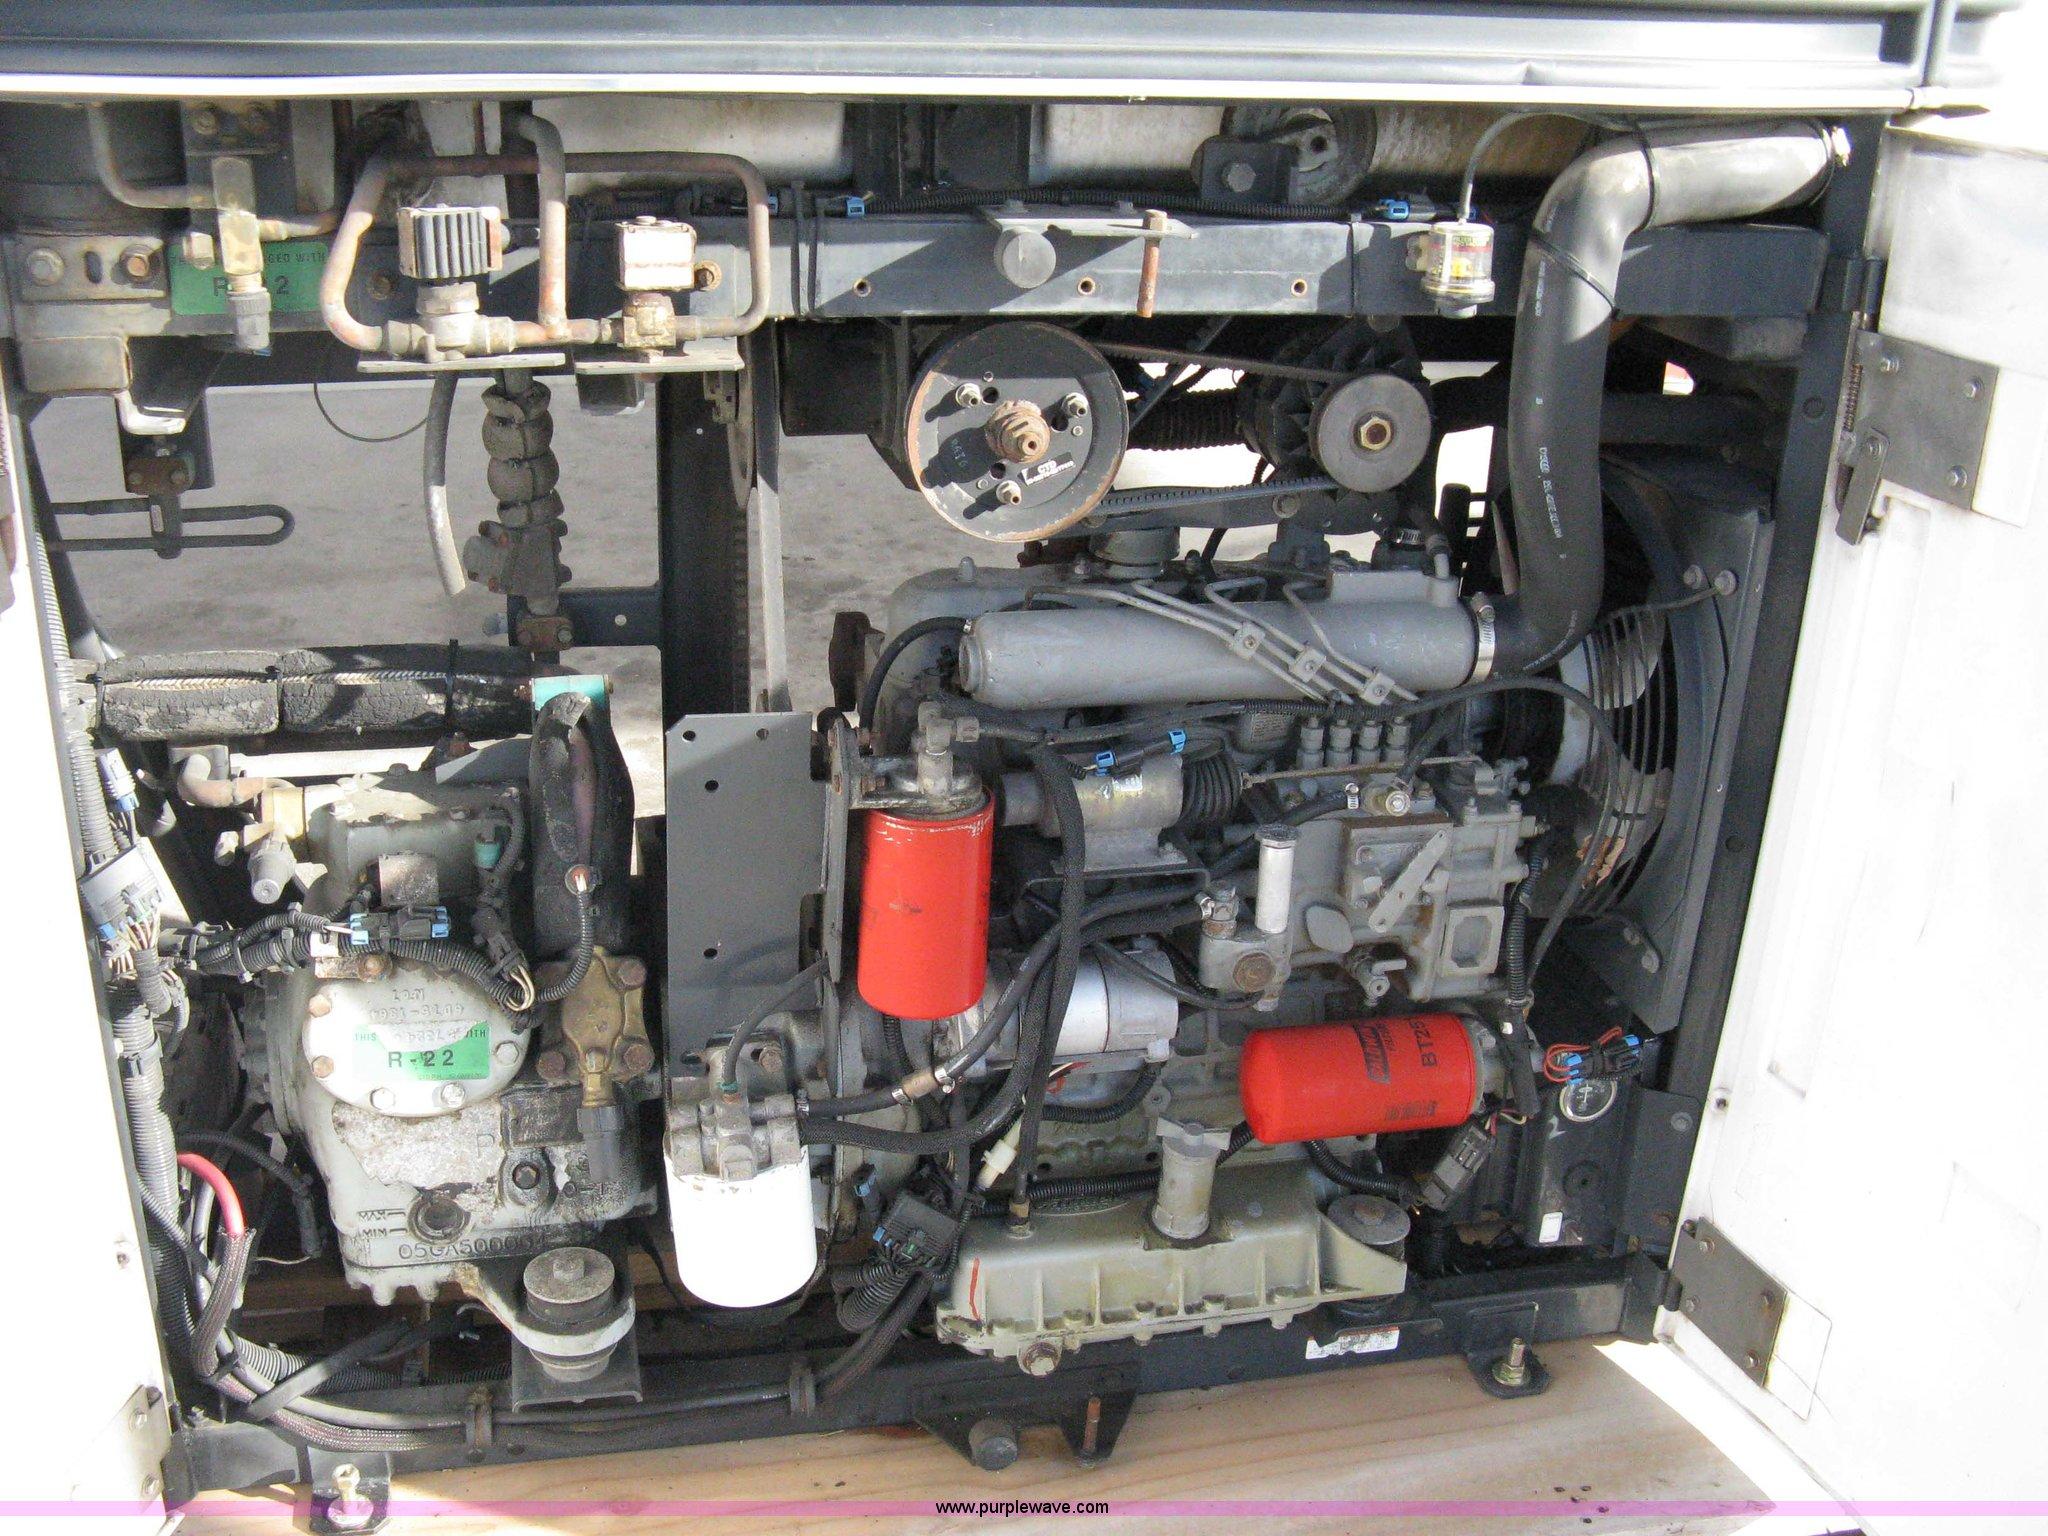 ... Carrier Phoenix Ultra Ultima 53 R22 refrigeration unit Full size in new  window ...